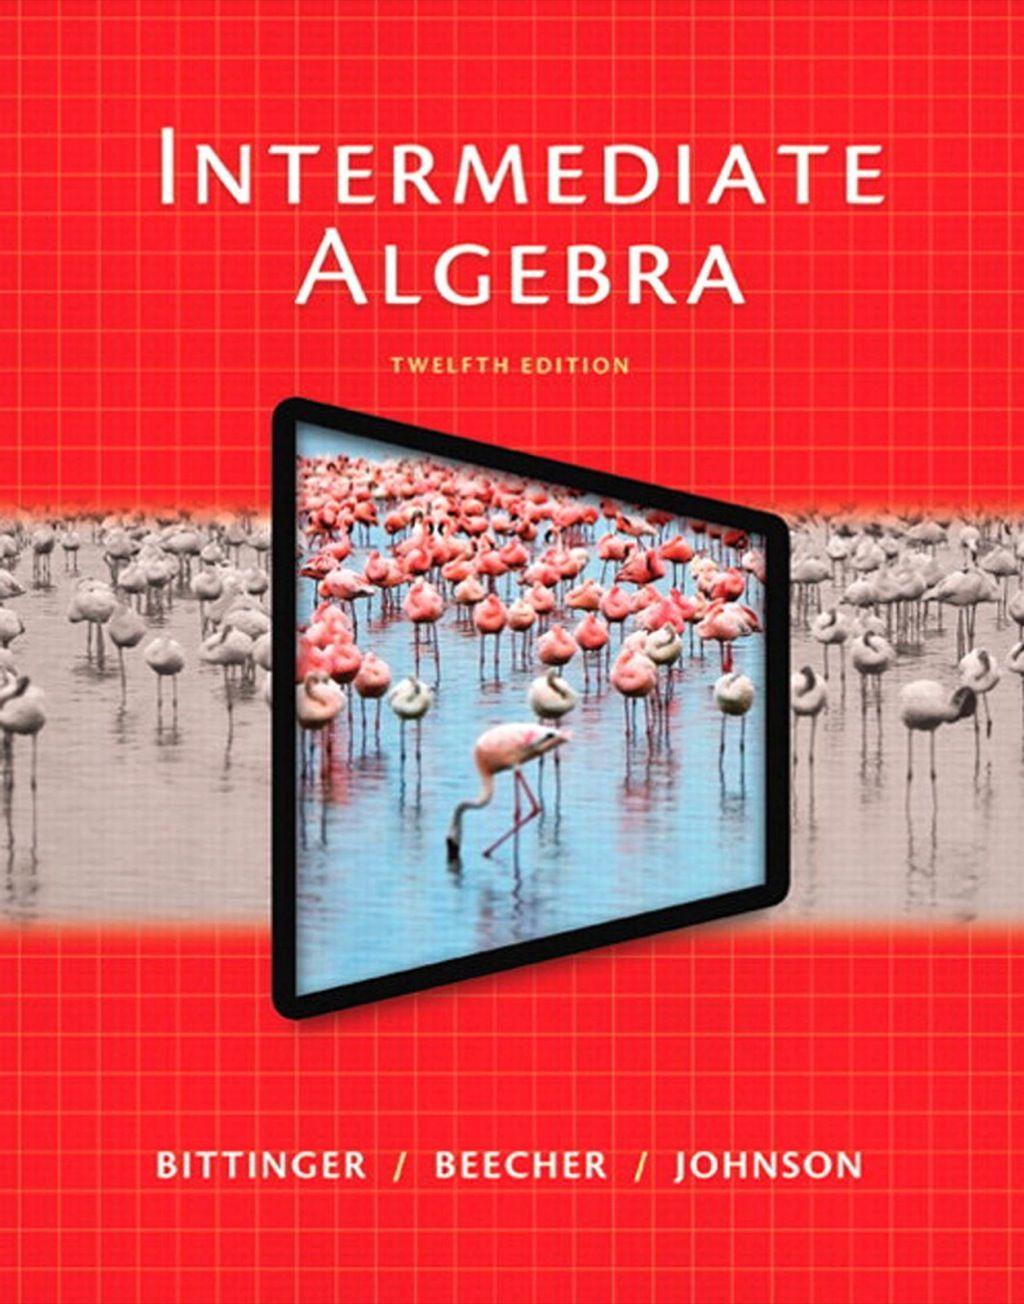 Intermediate Algebra Ebook Rental In